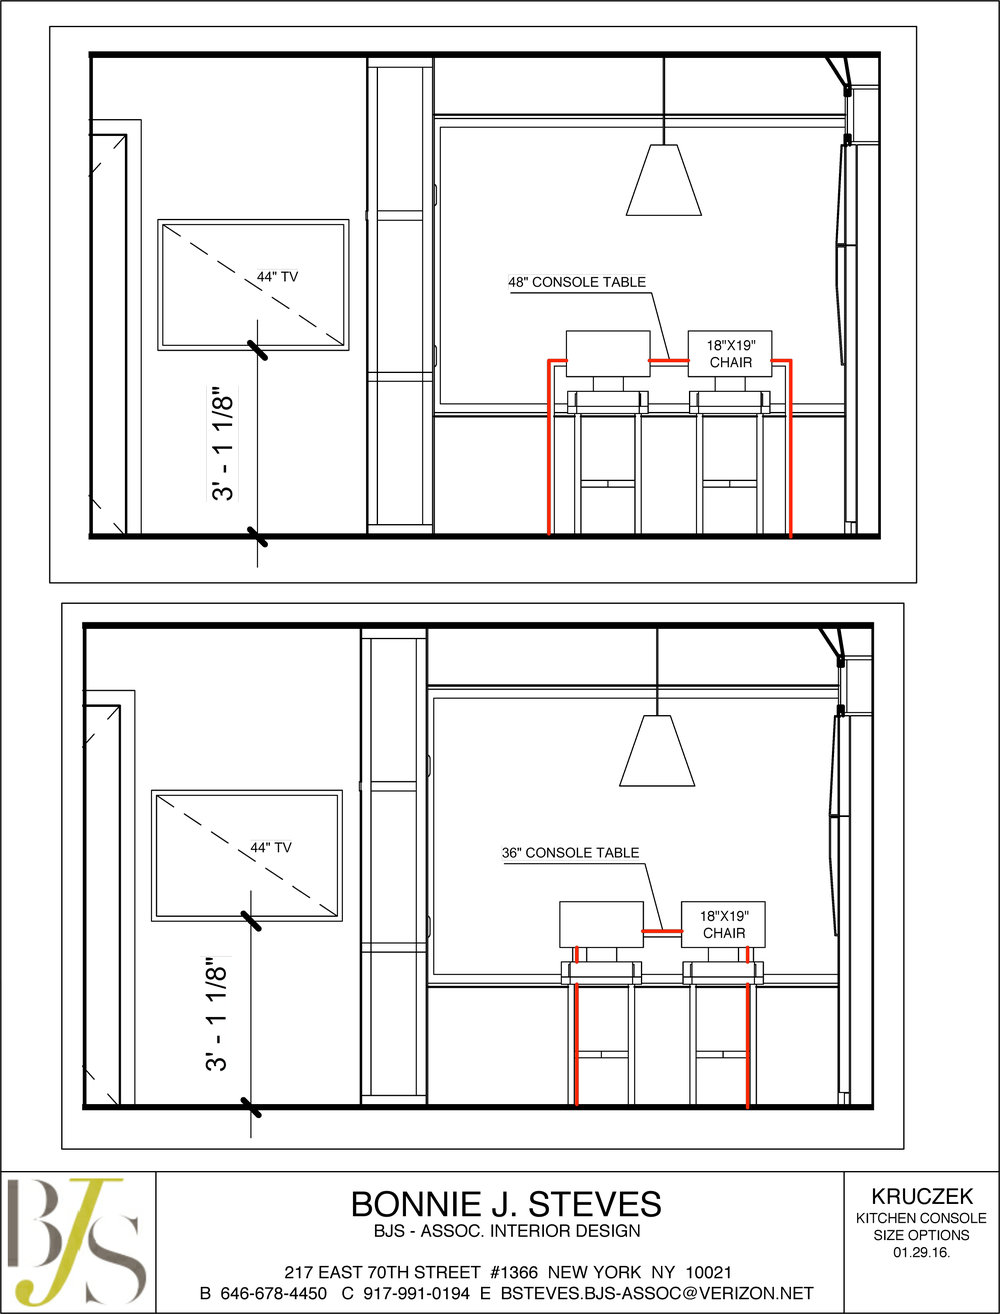 KRUCZEK-KITCHEN CONSOLE DIMENSIONS-01.29.16.jpg